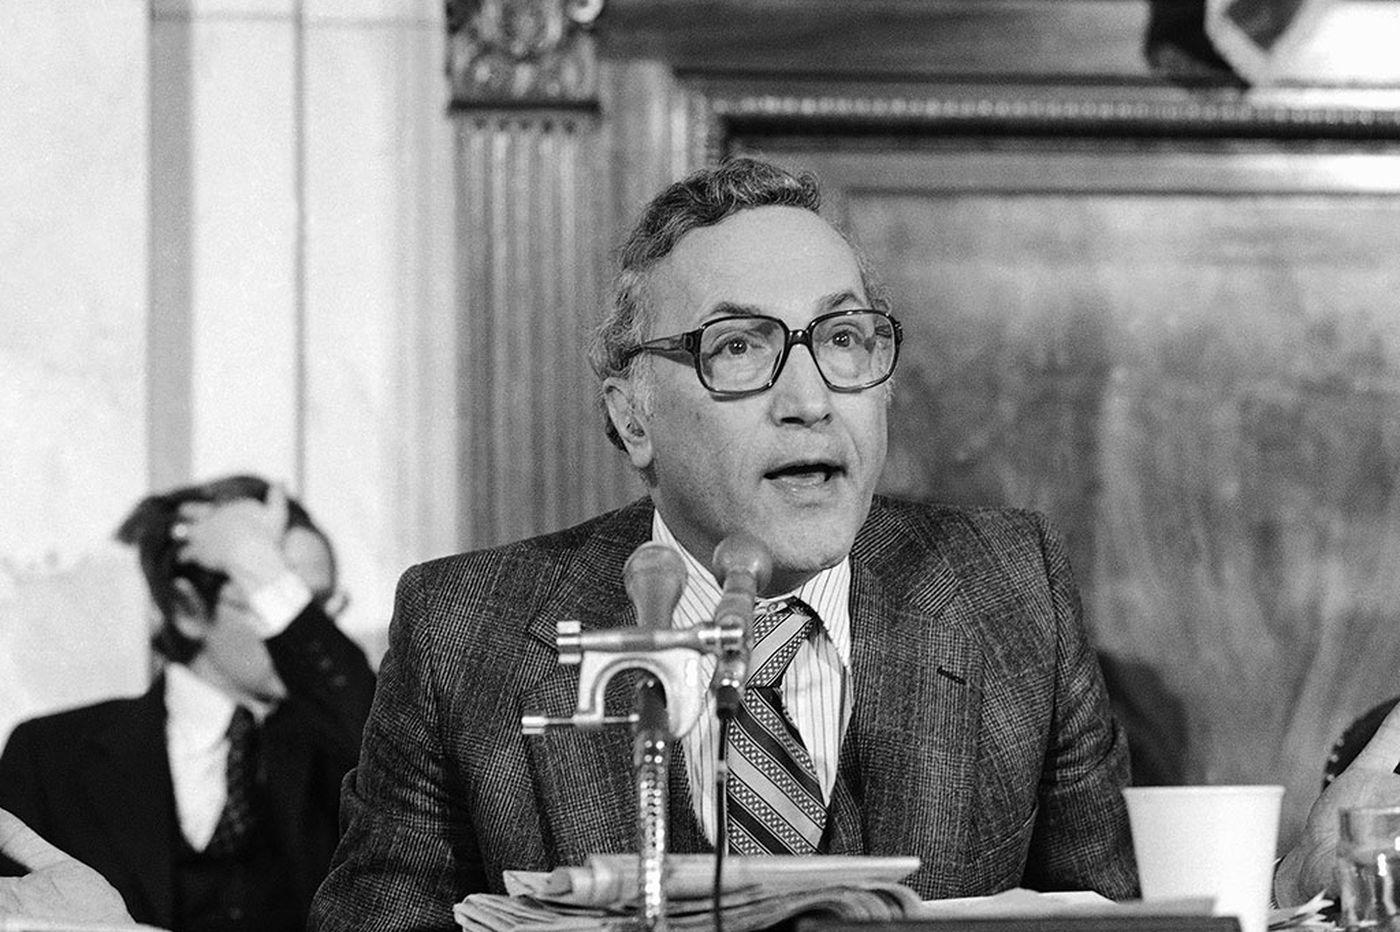 Former senator, cabinet secretary, Richard Schweiker, 89, dies